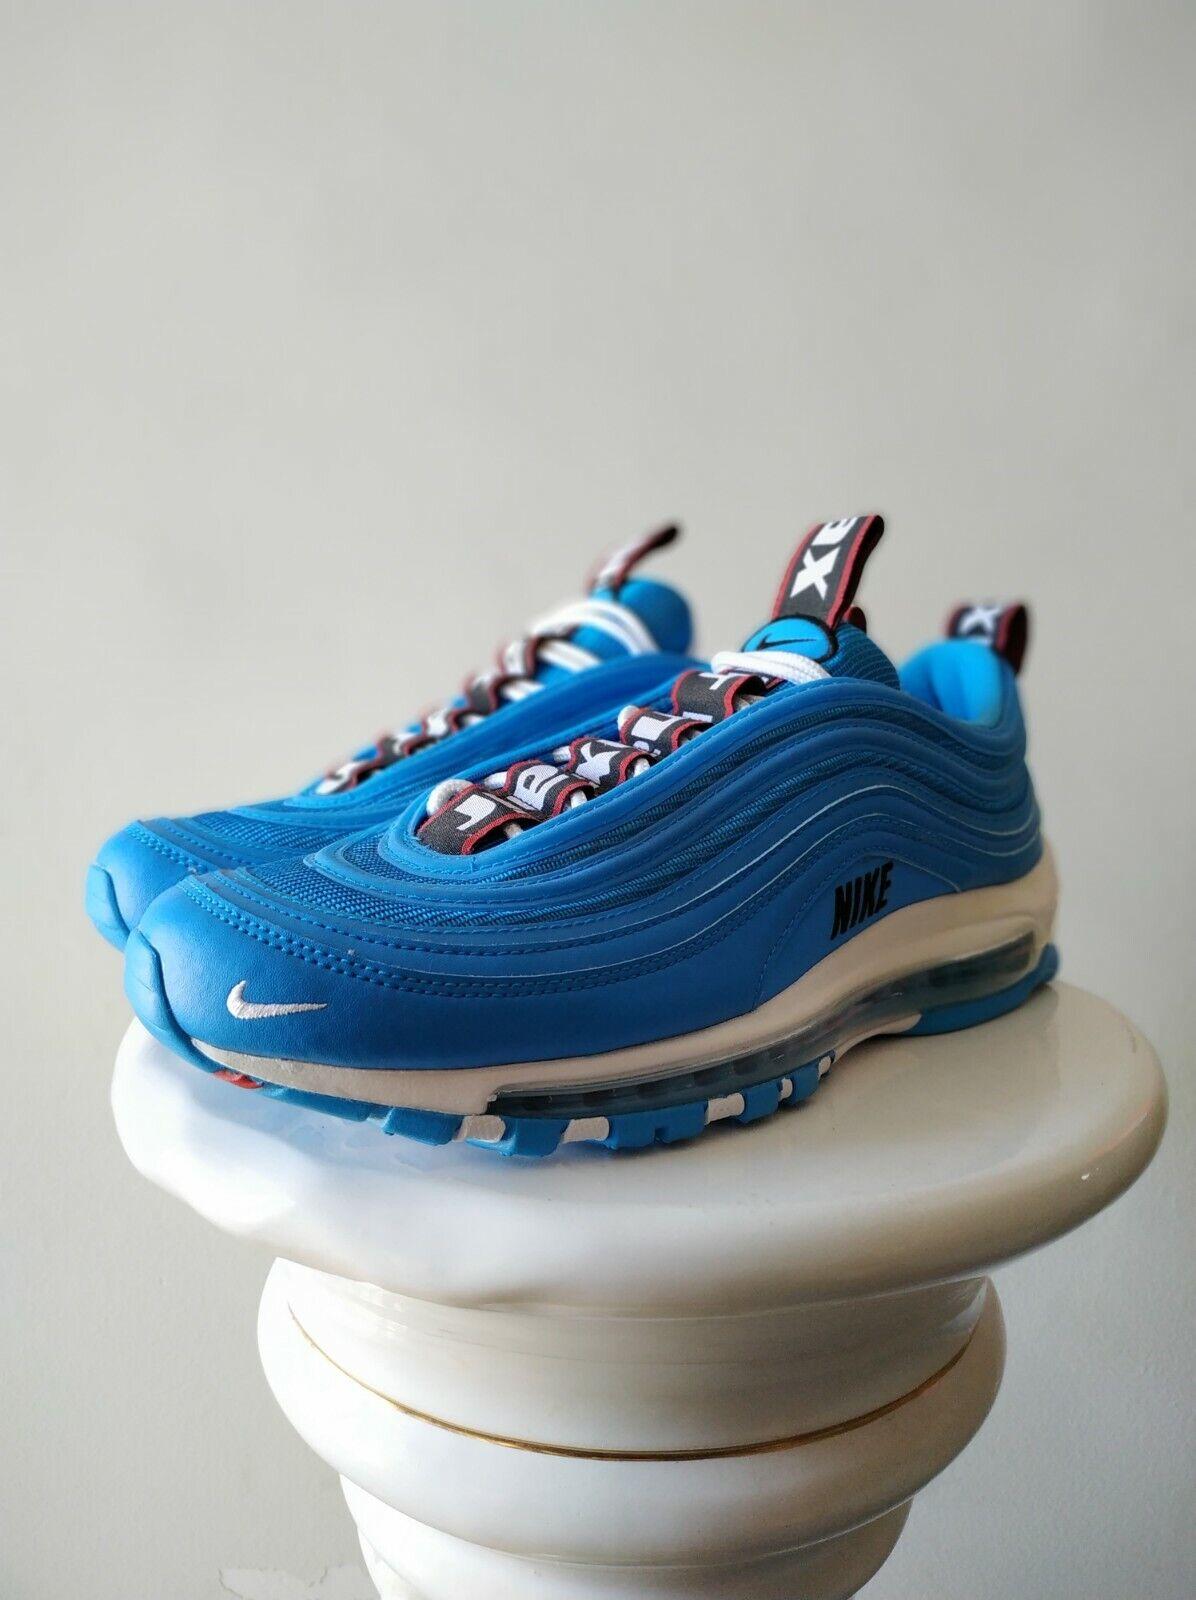 Nike Air Max 97 Bleu Premium Hero Noir Blanc 312834-401 US 8.5 EU 42 UK 7.5